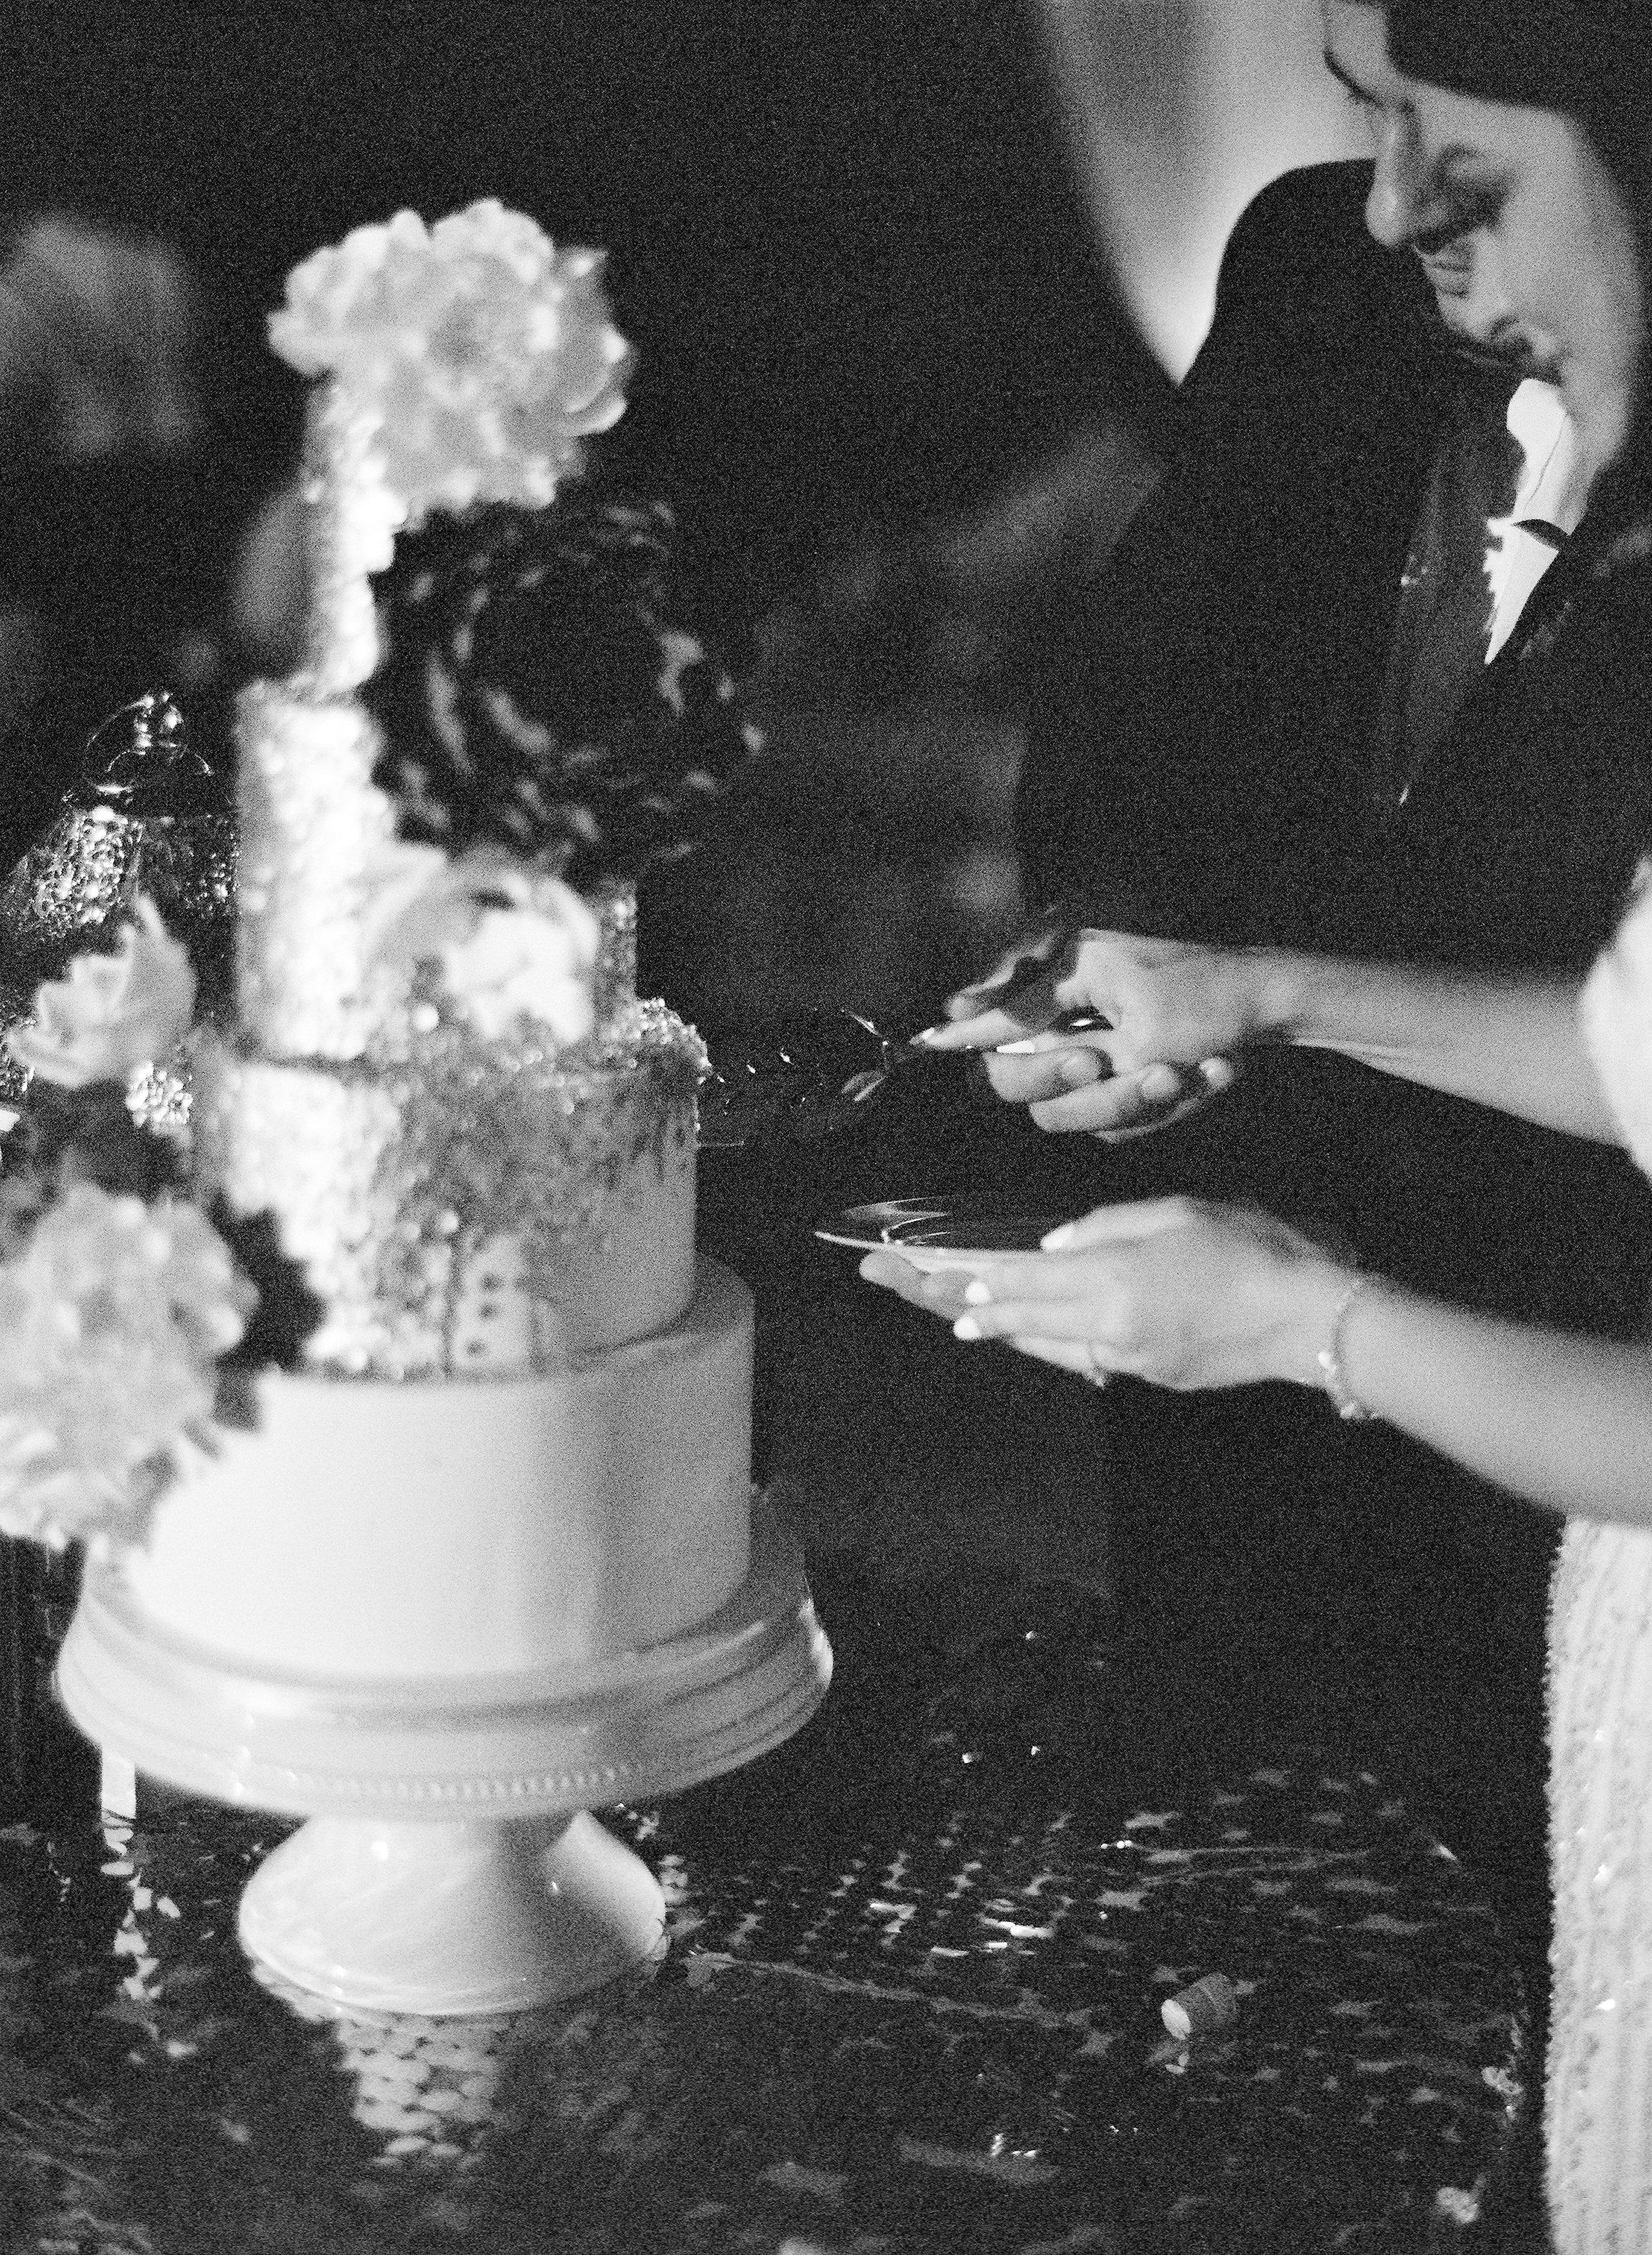 Amador_County_Wedding_Bride_Groom_Cake_Cutting_Rancho_Victoria_Vineyard_Northern_California.jpg